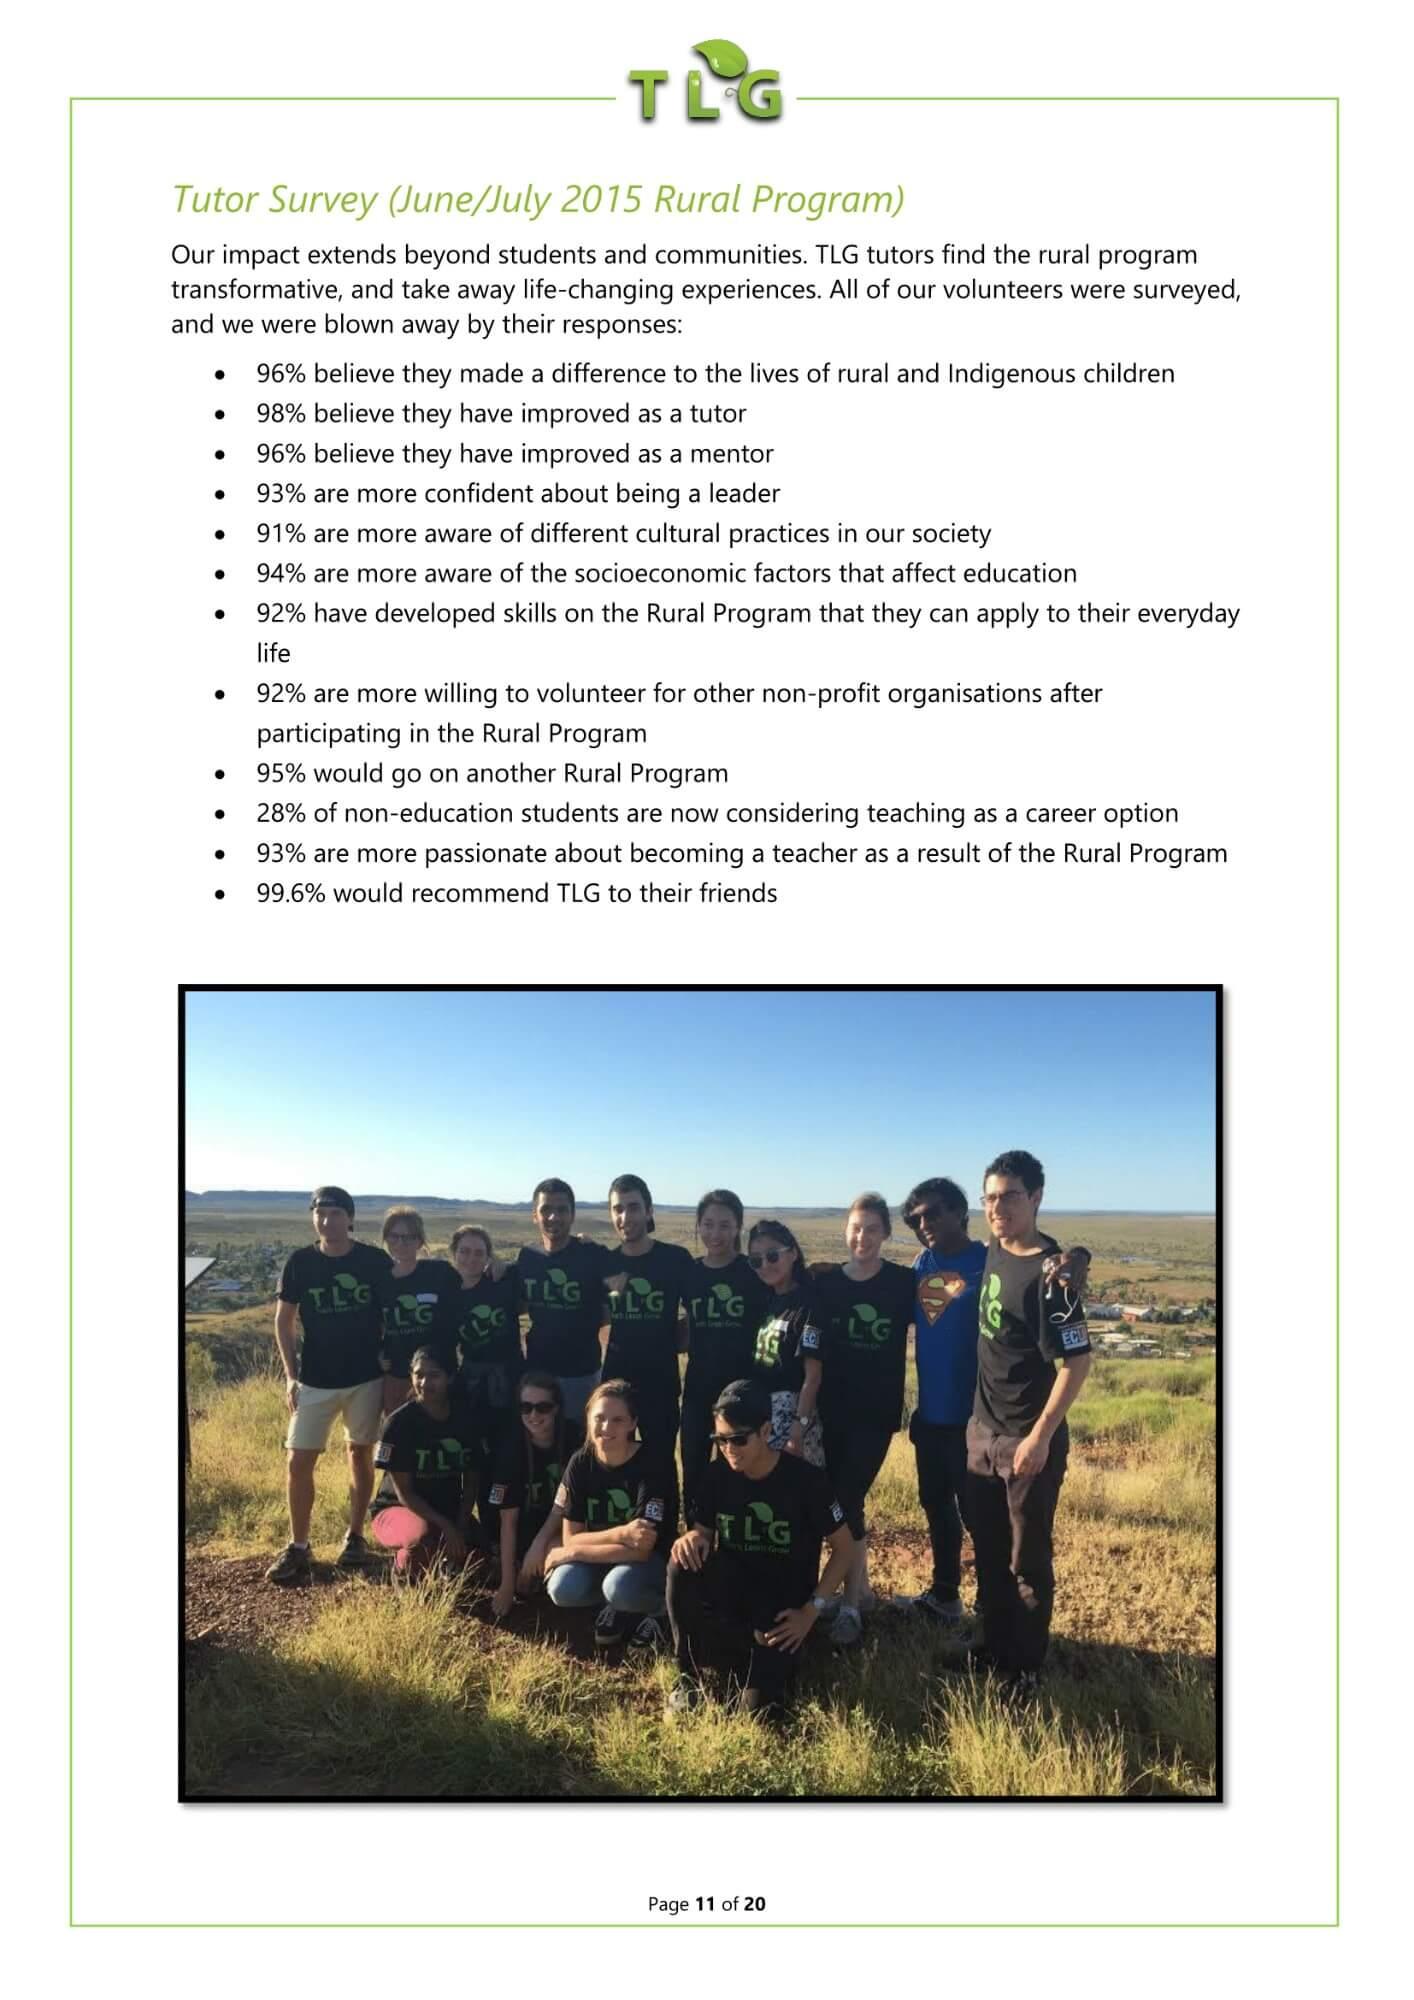 tlg-annual-report-FY14-11.jpg